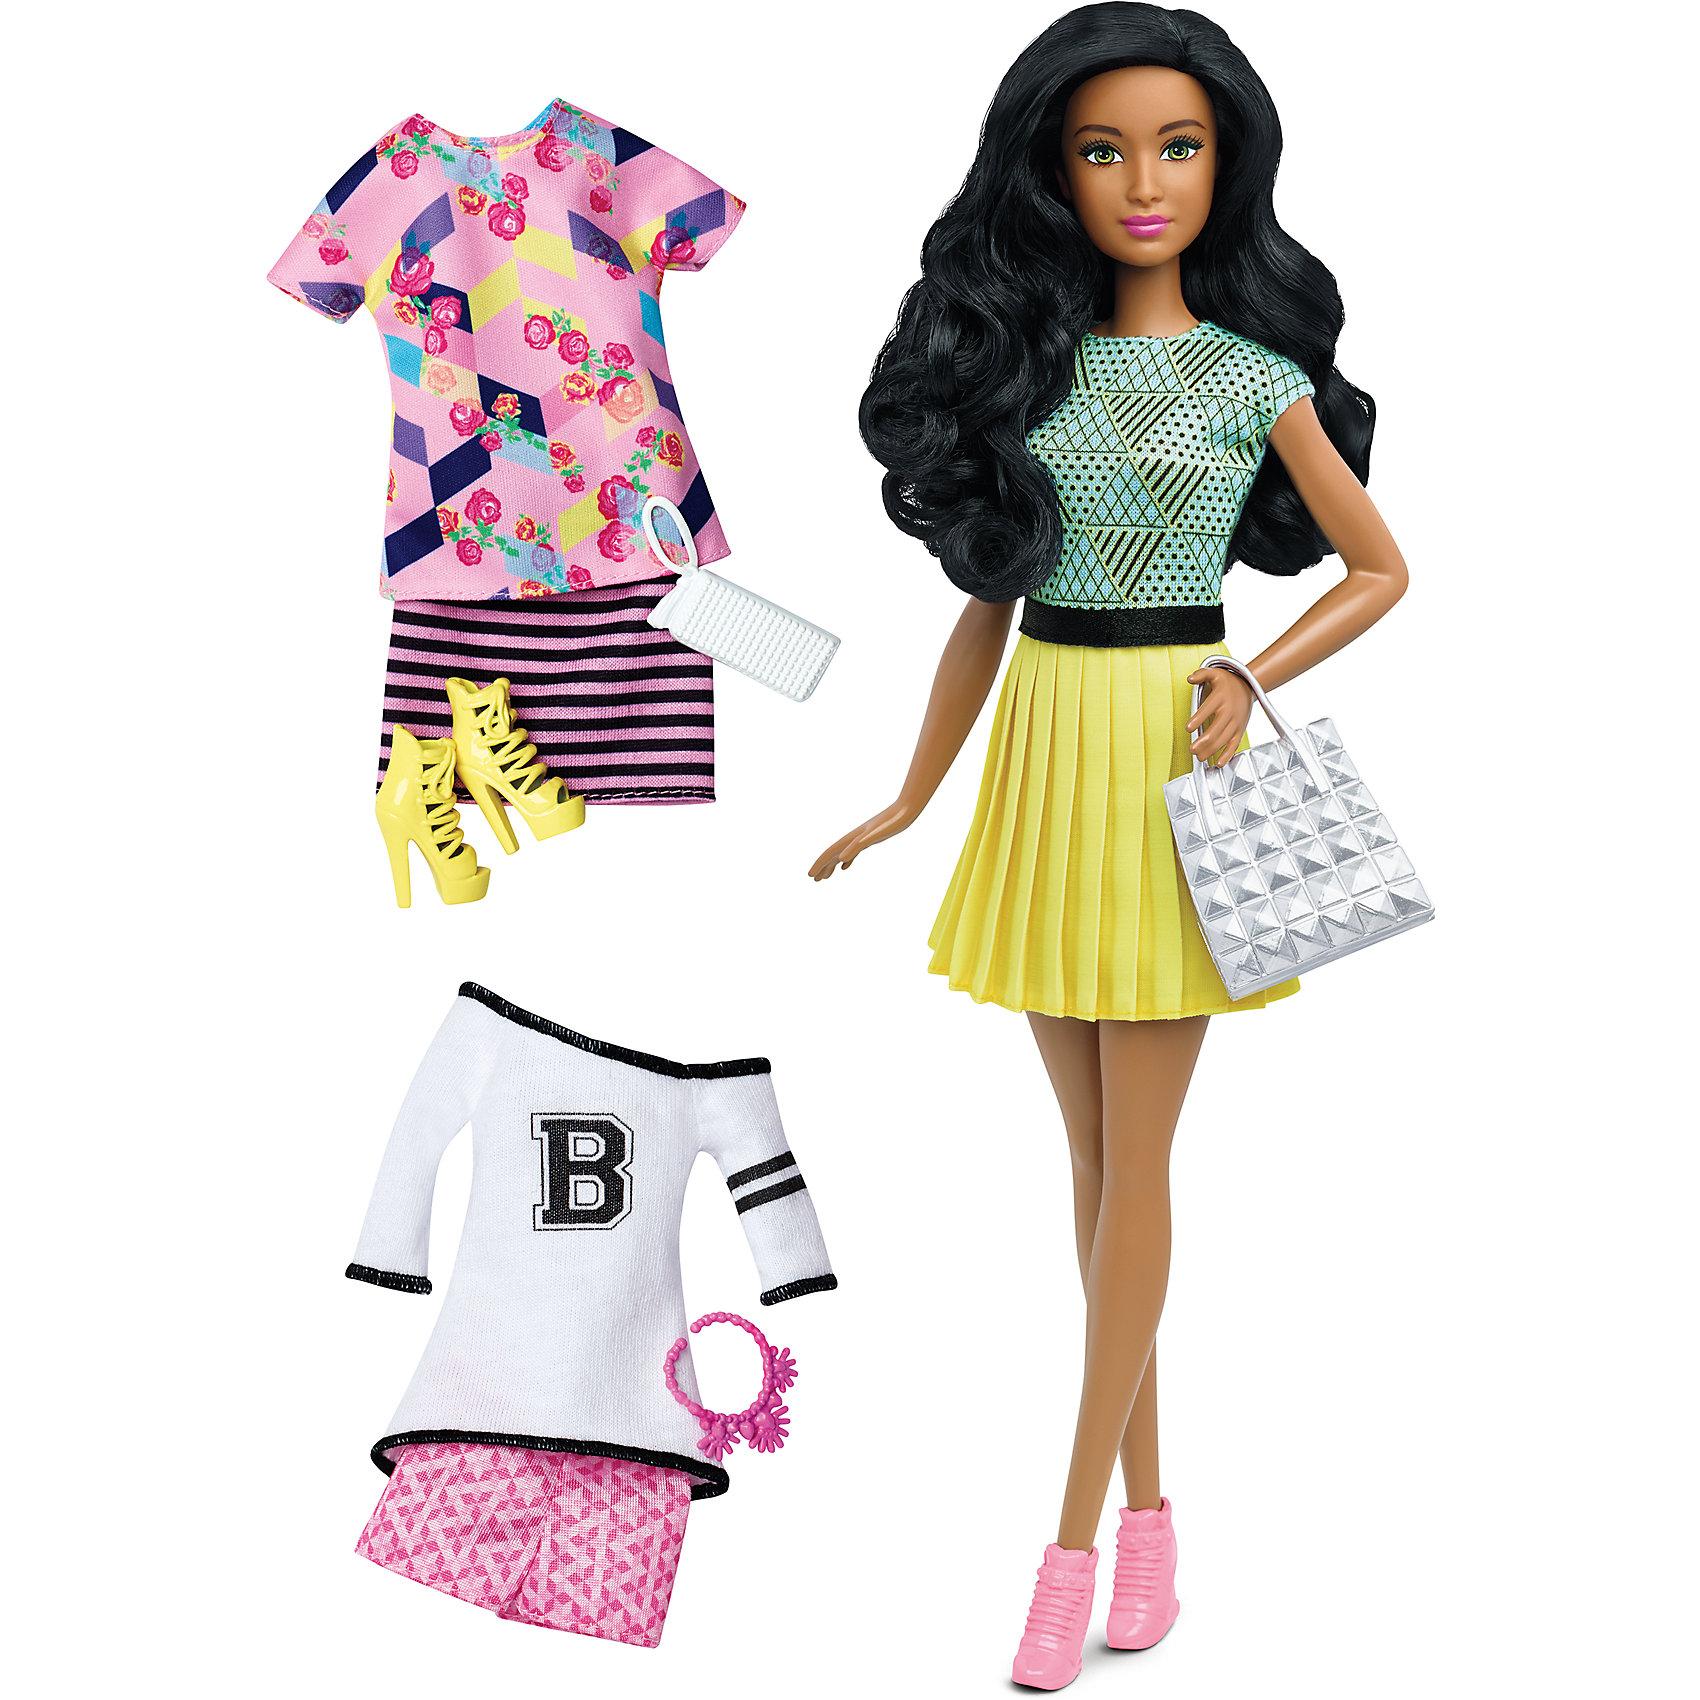 Mattel Кукла + набор одежды, Barbie куклы moose кукла